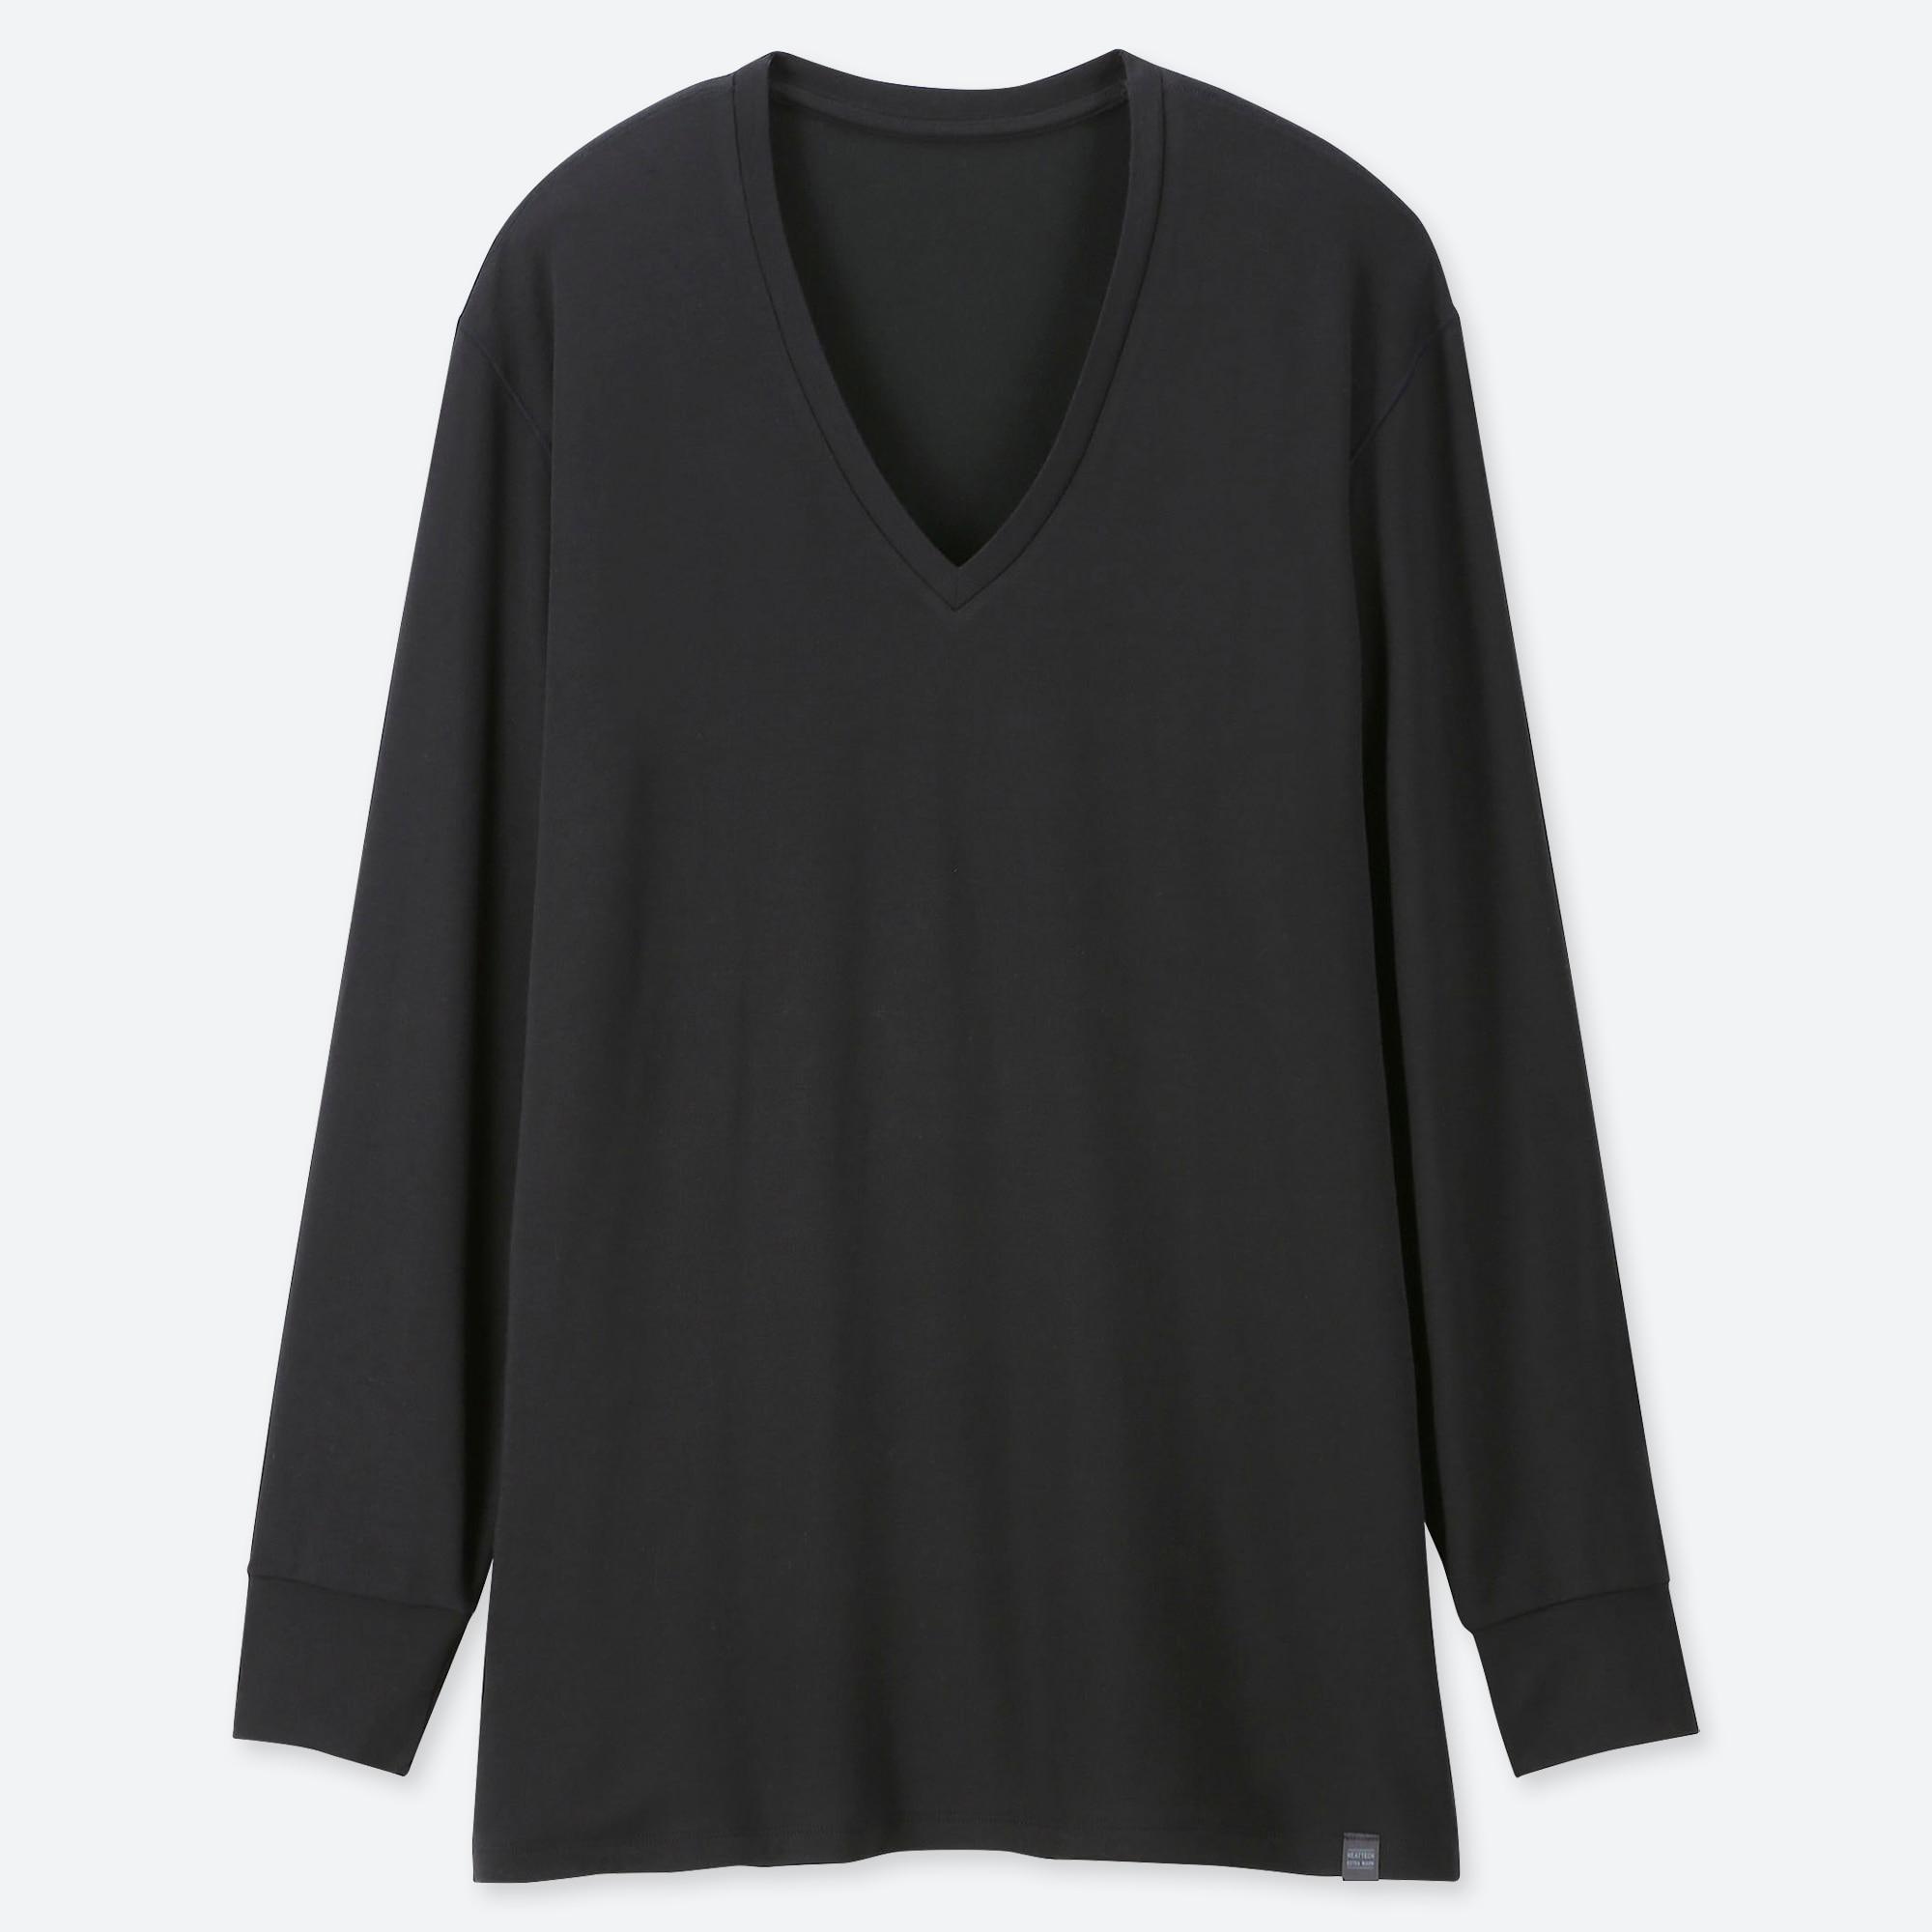 men HEATTECH extra warm v-neck long-sleeve t-shirt